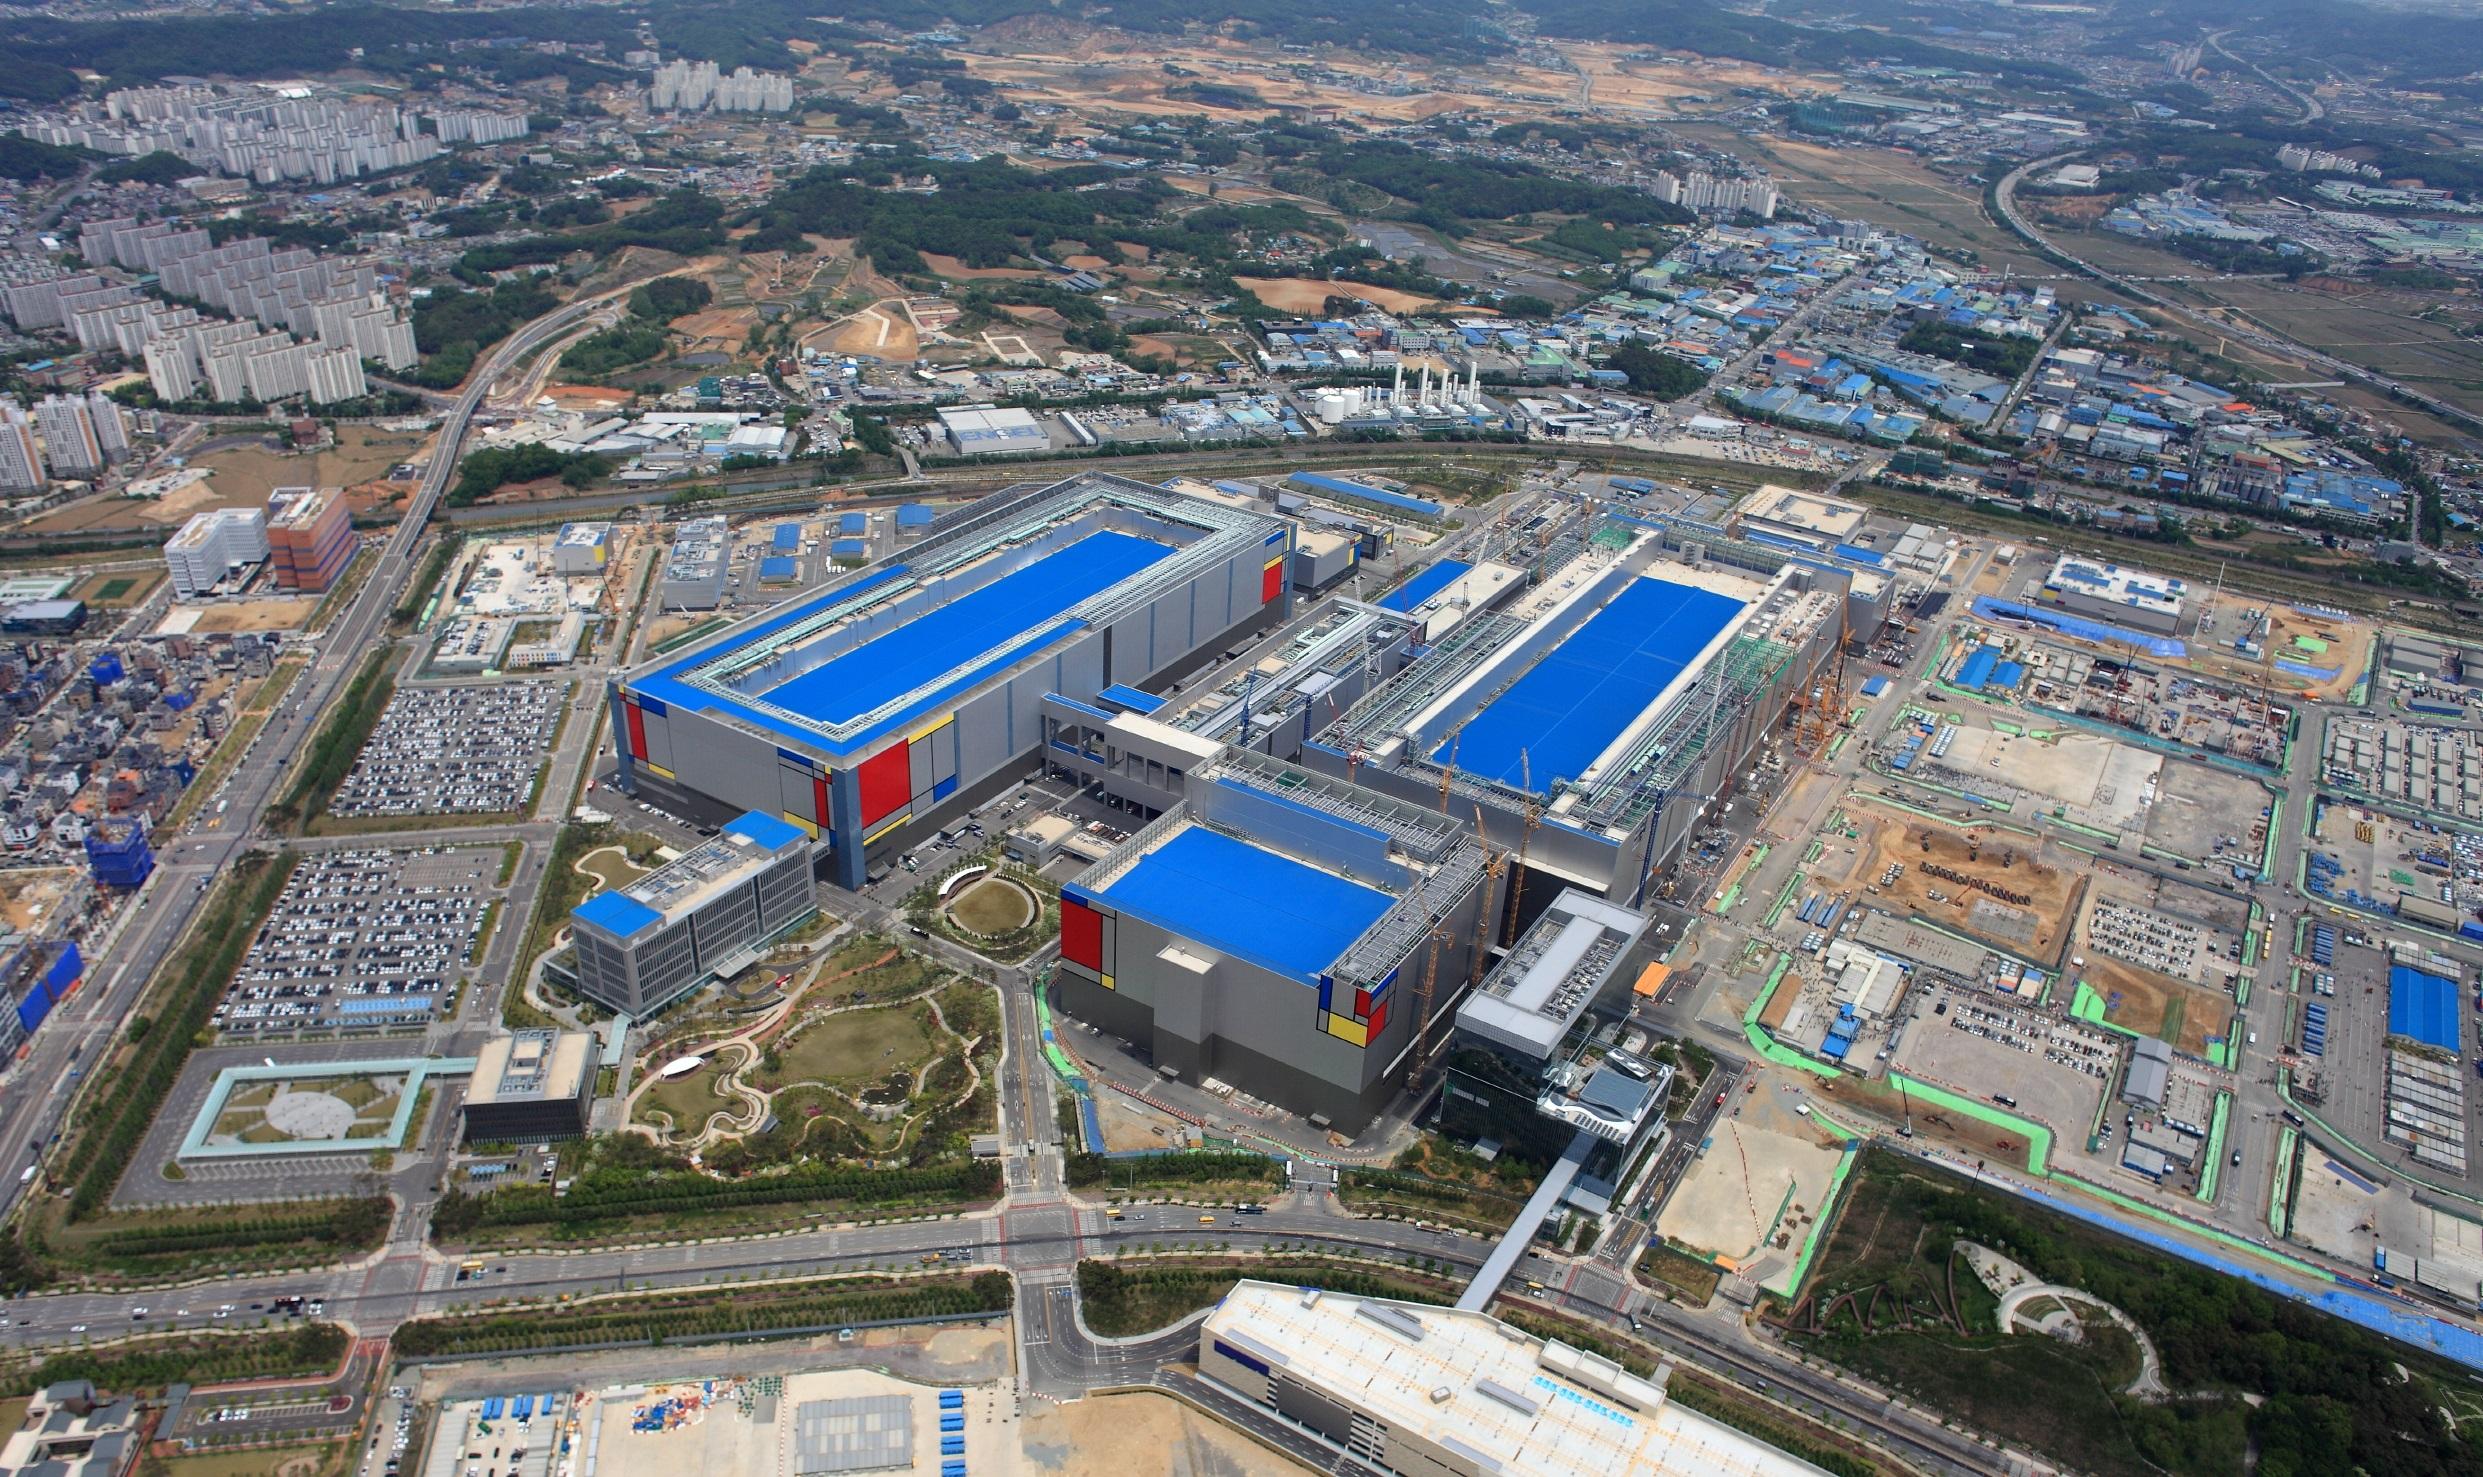 Samsung starts building cutting-edge 5-nanometer chip production line